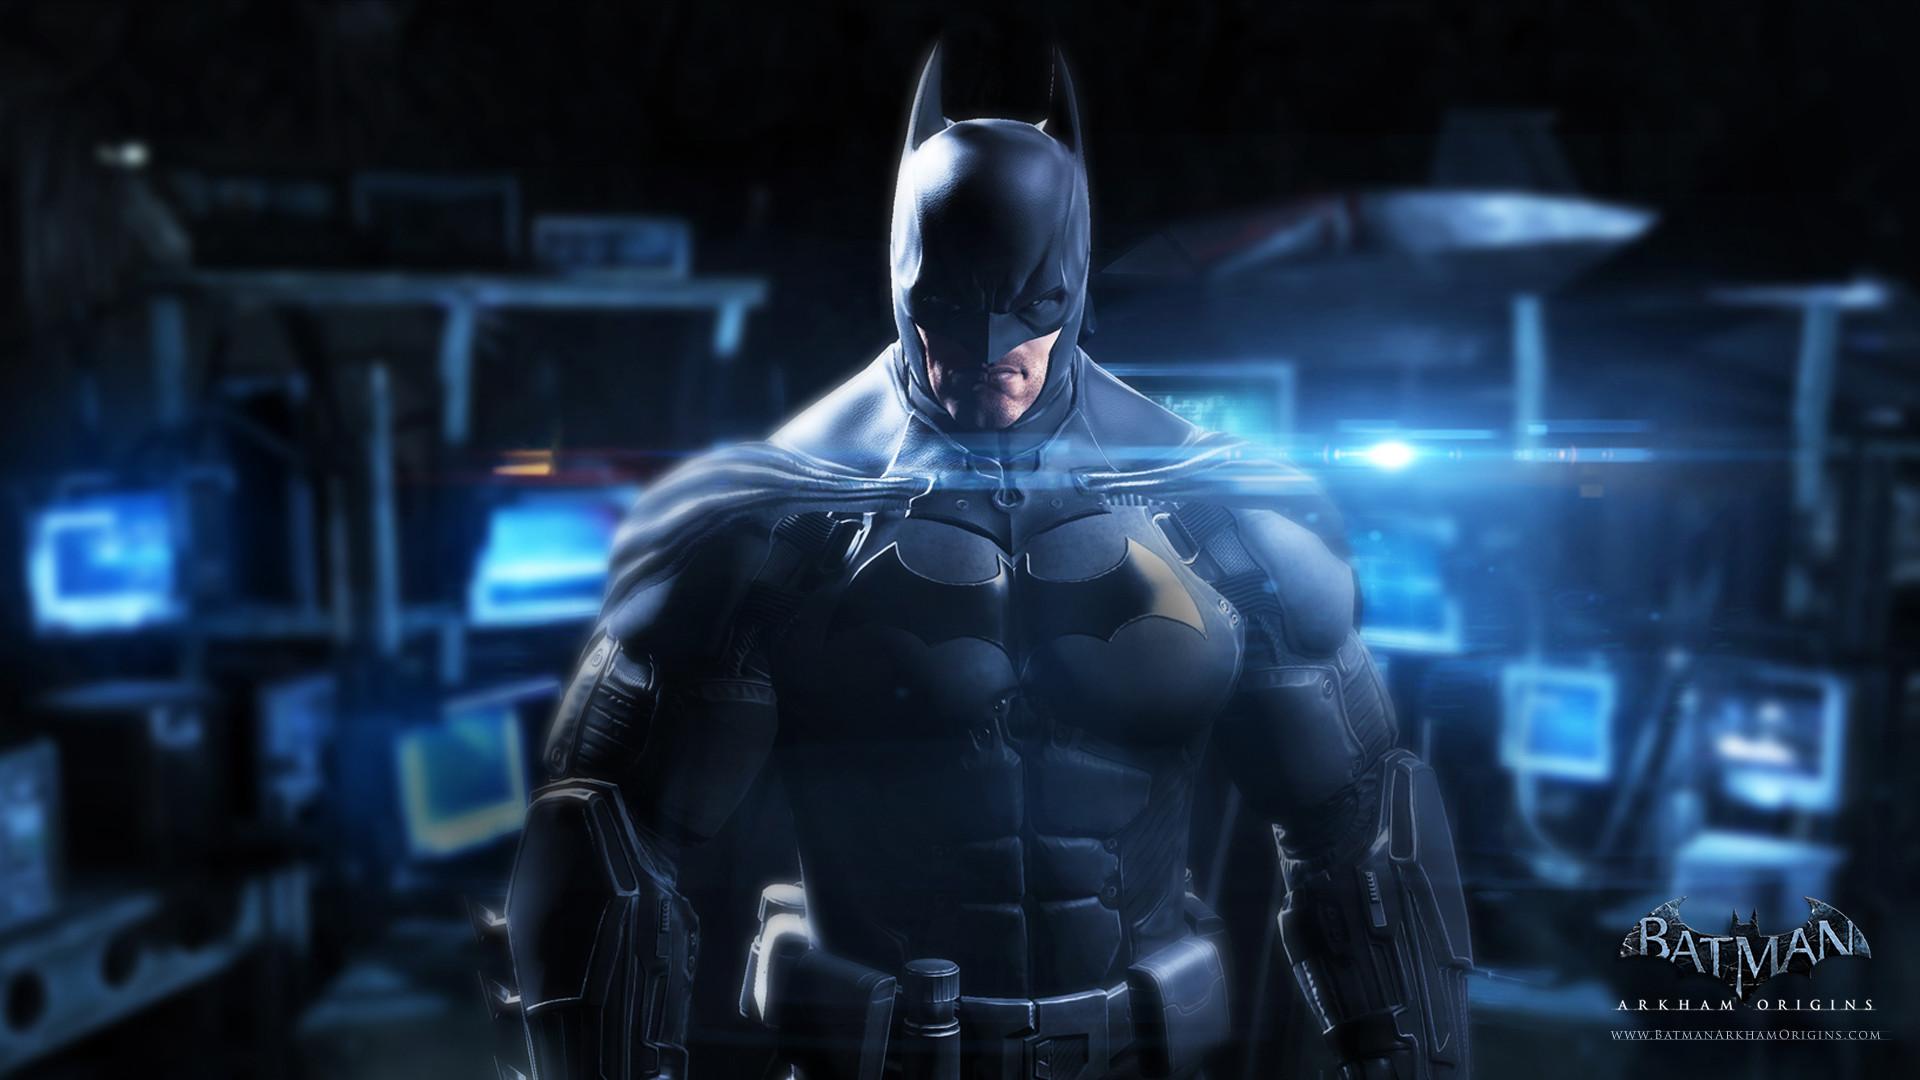 Snowy Street | Backgrounds | Pinterest | Batman arkham origins, Character  concept art and Character concept